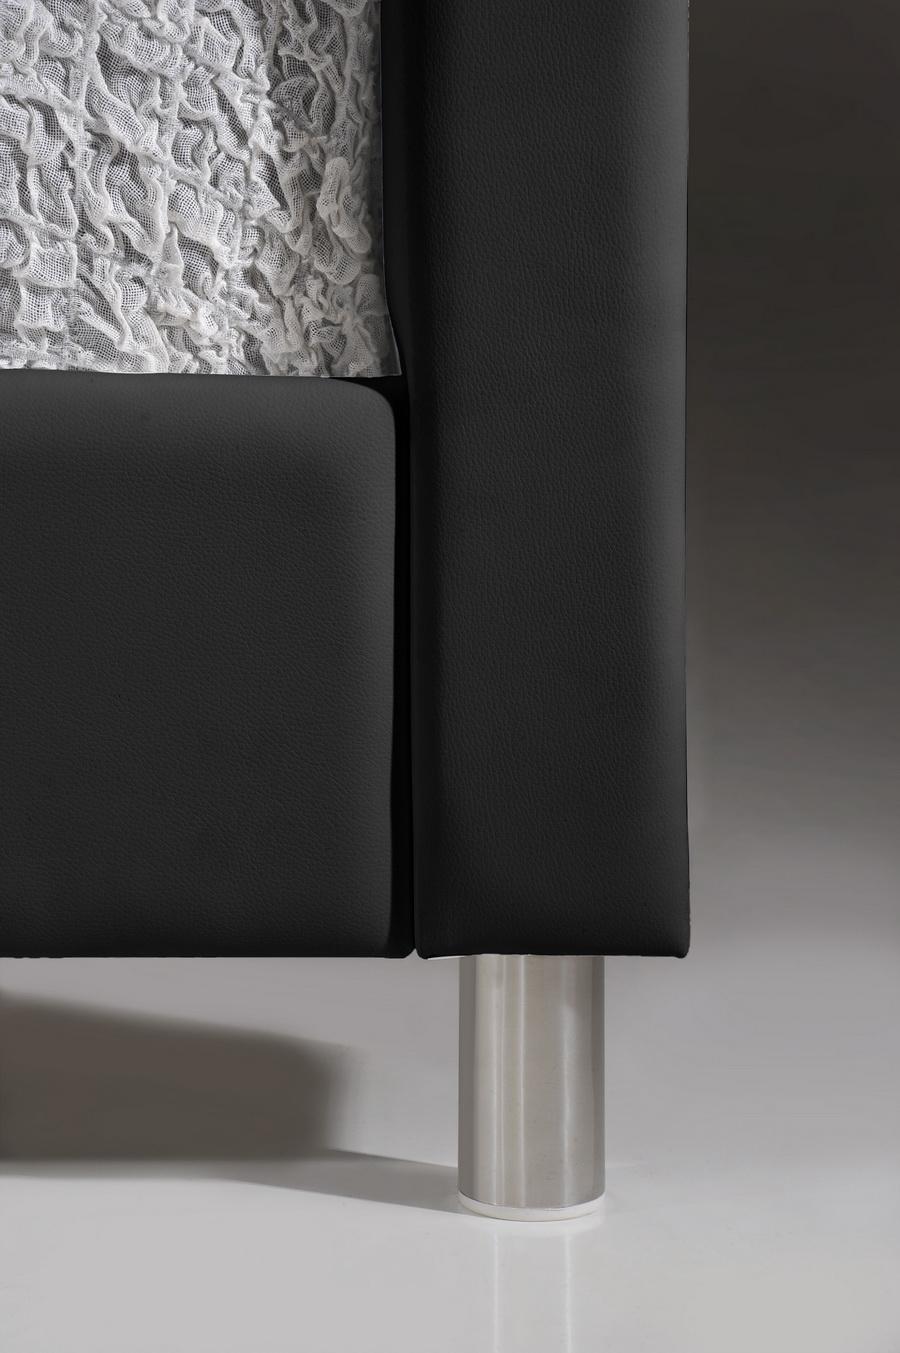 baxton studio carlotta black modern bed with upholstered headboard king size - Upholstered Headboard King